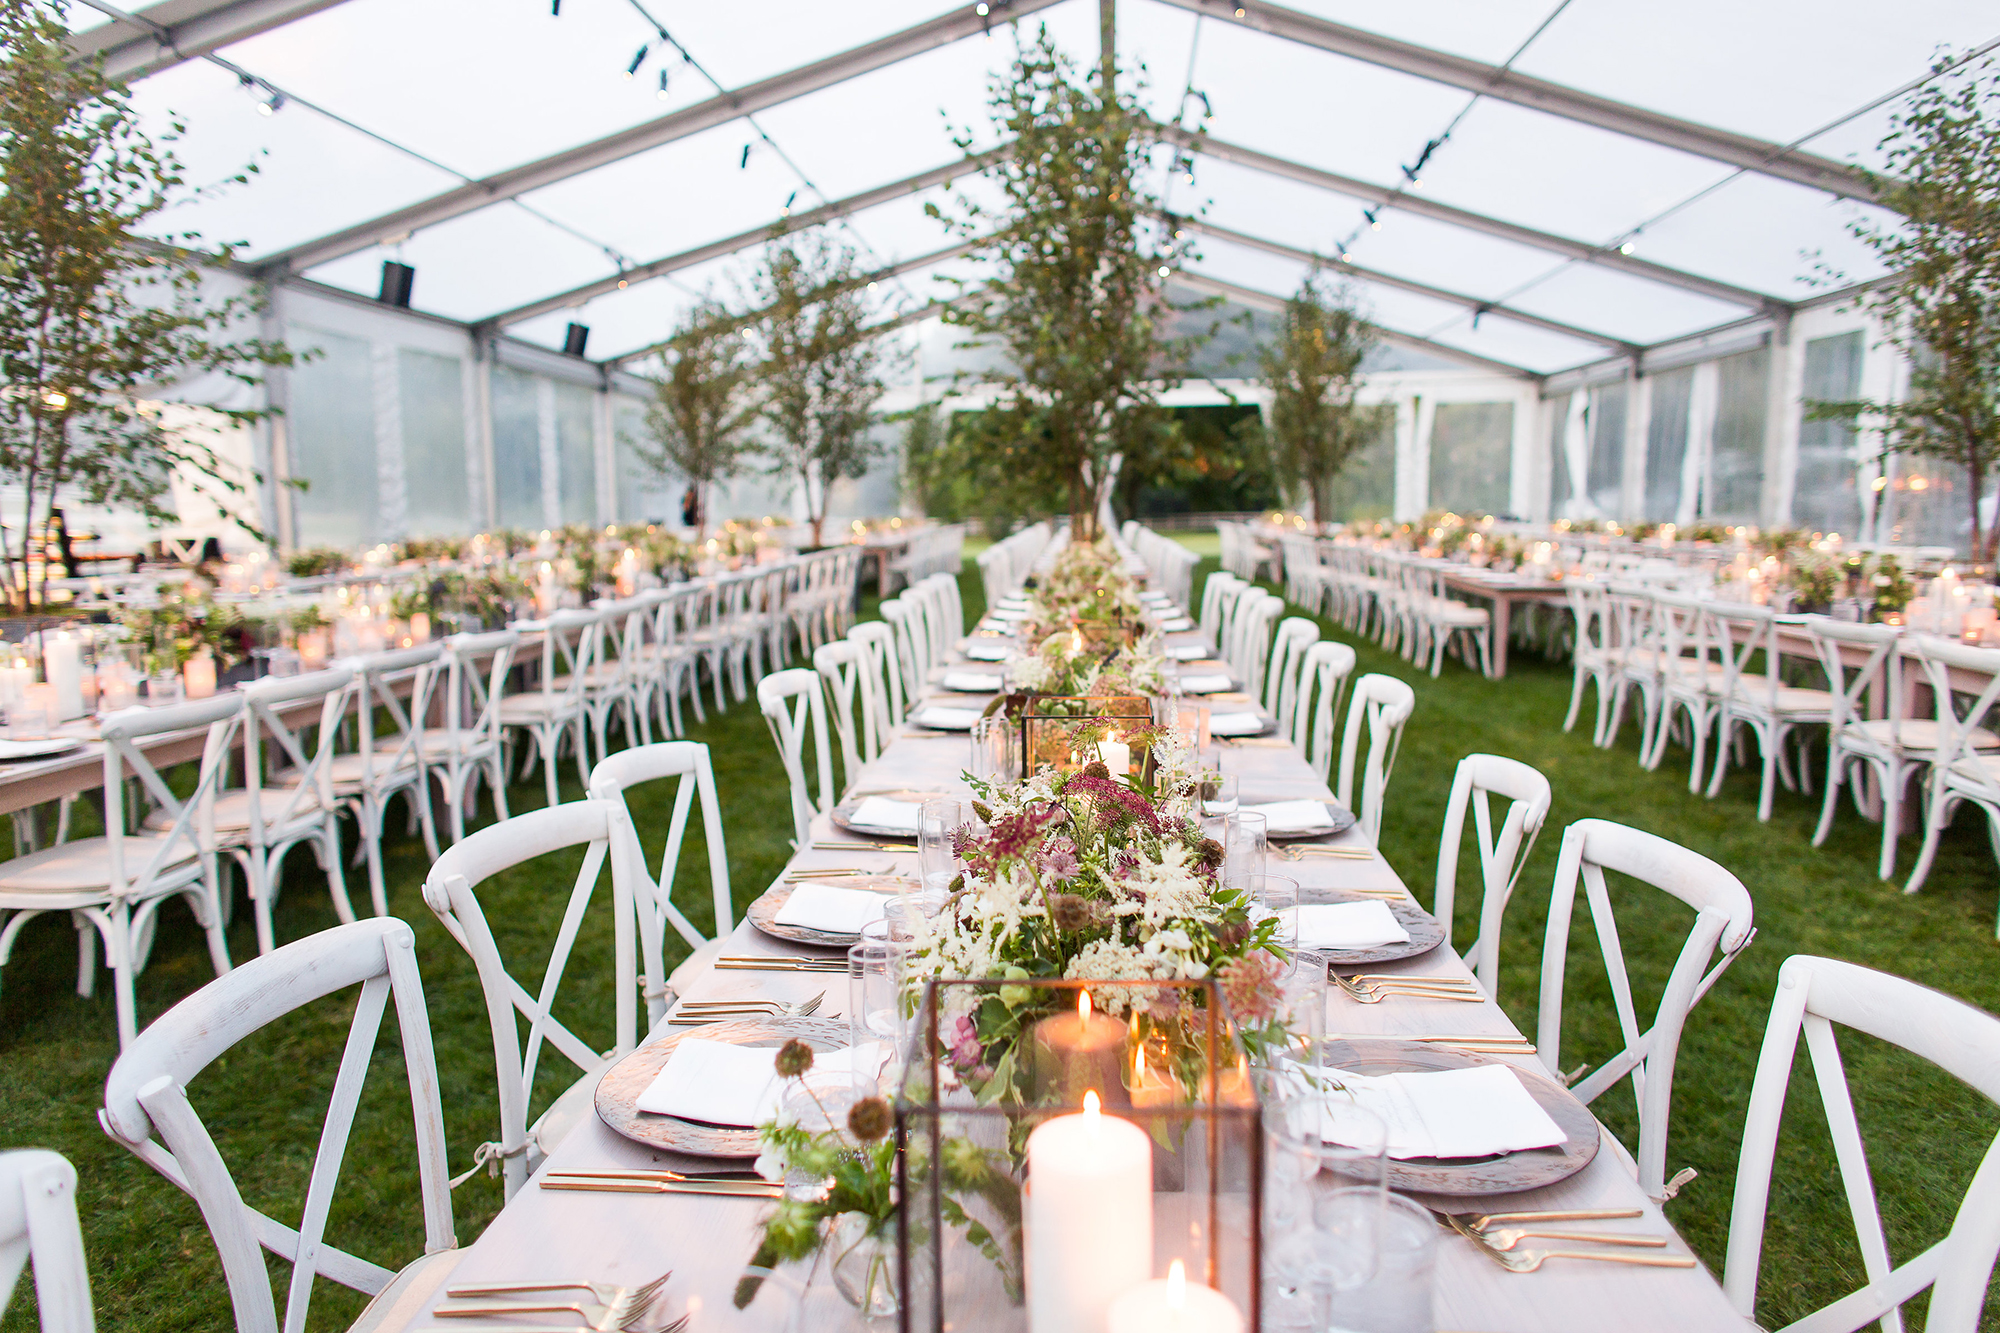 000_Garden Wedding Clear Top Tent_AE Events.jpg